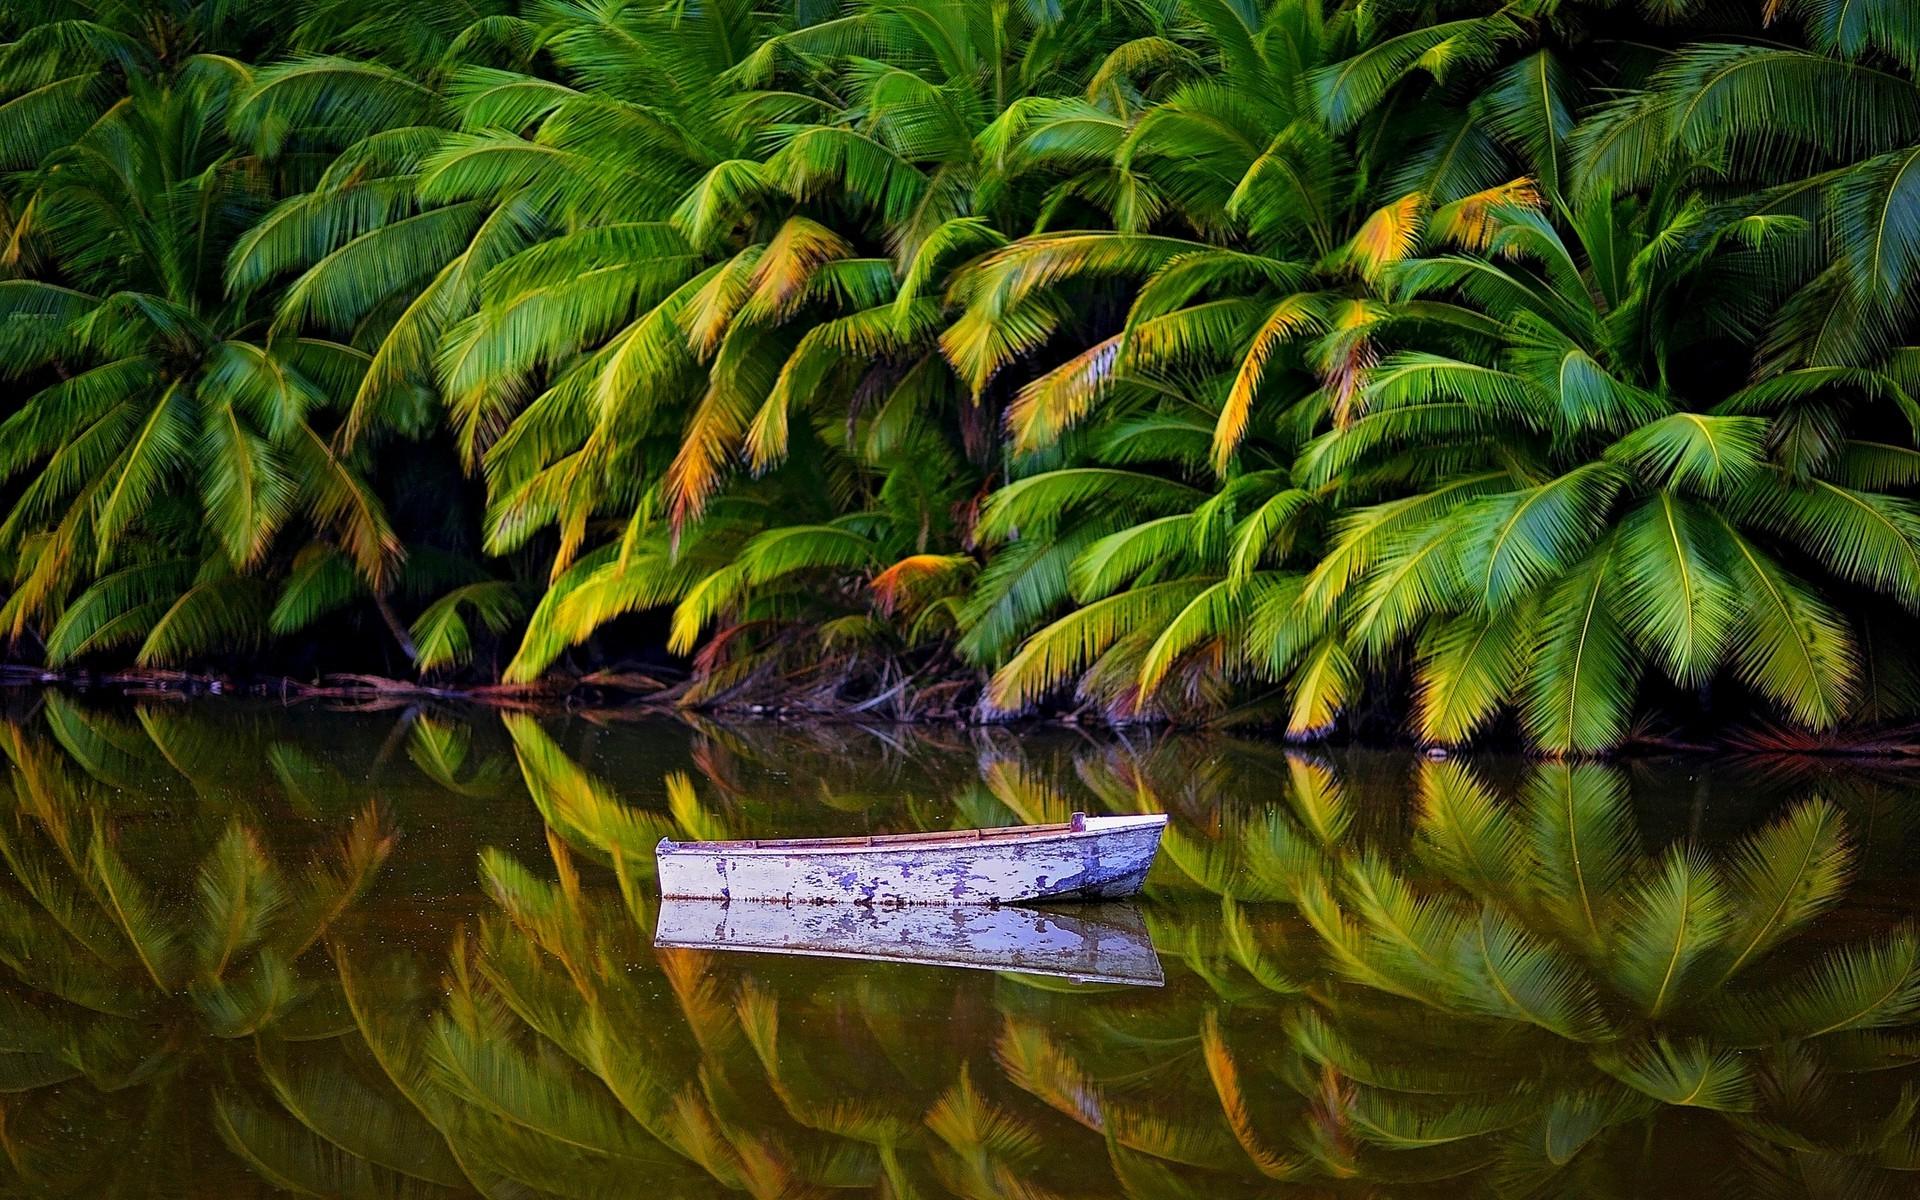 Wallpaper 1920x1200 Px Australia Boat Island Jungles